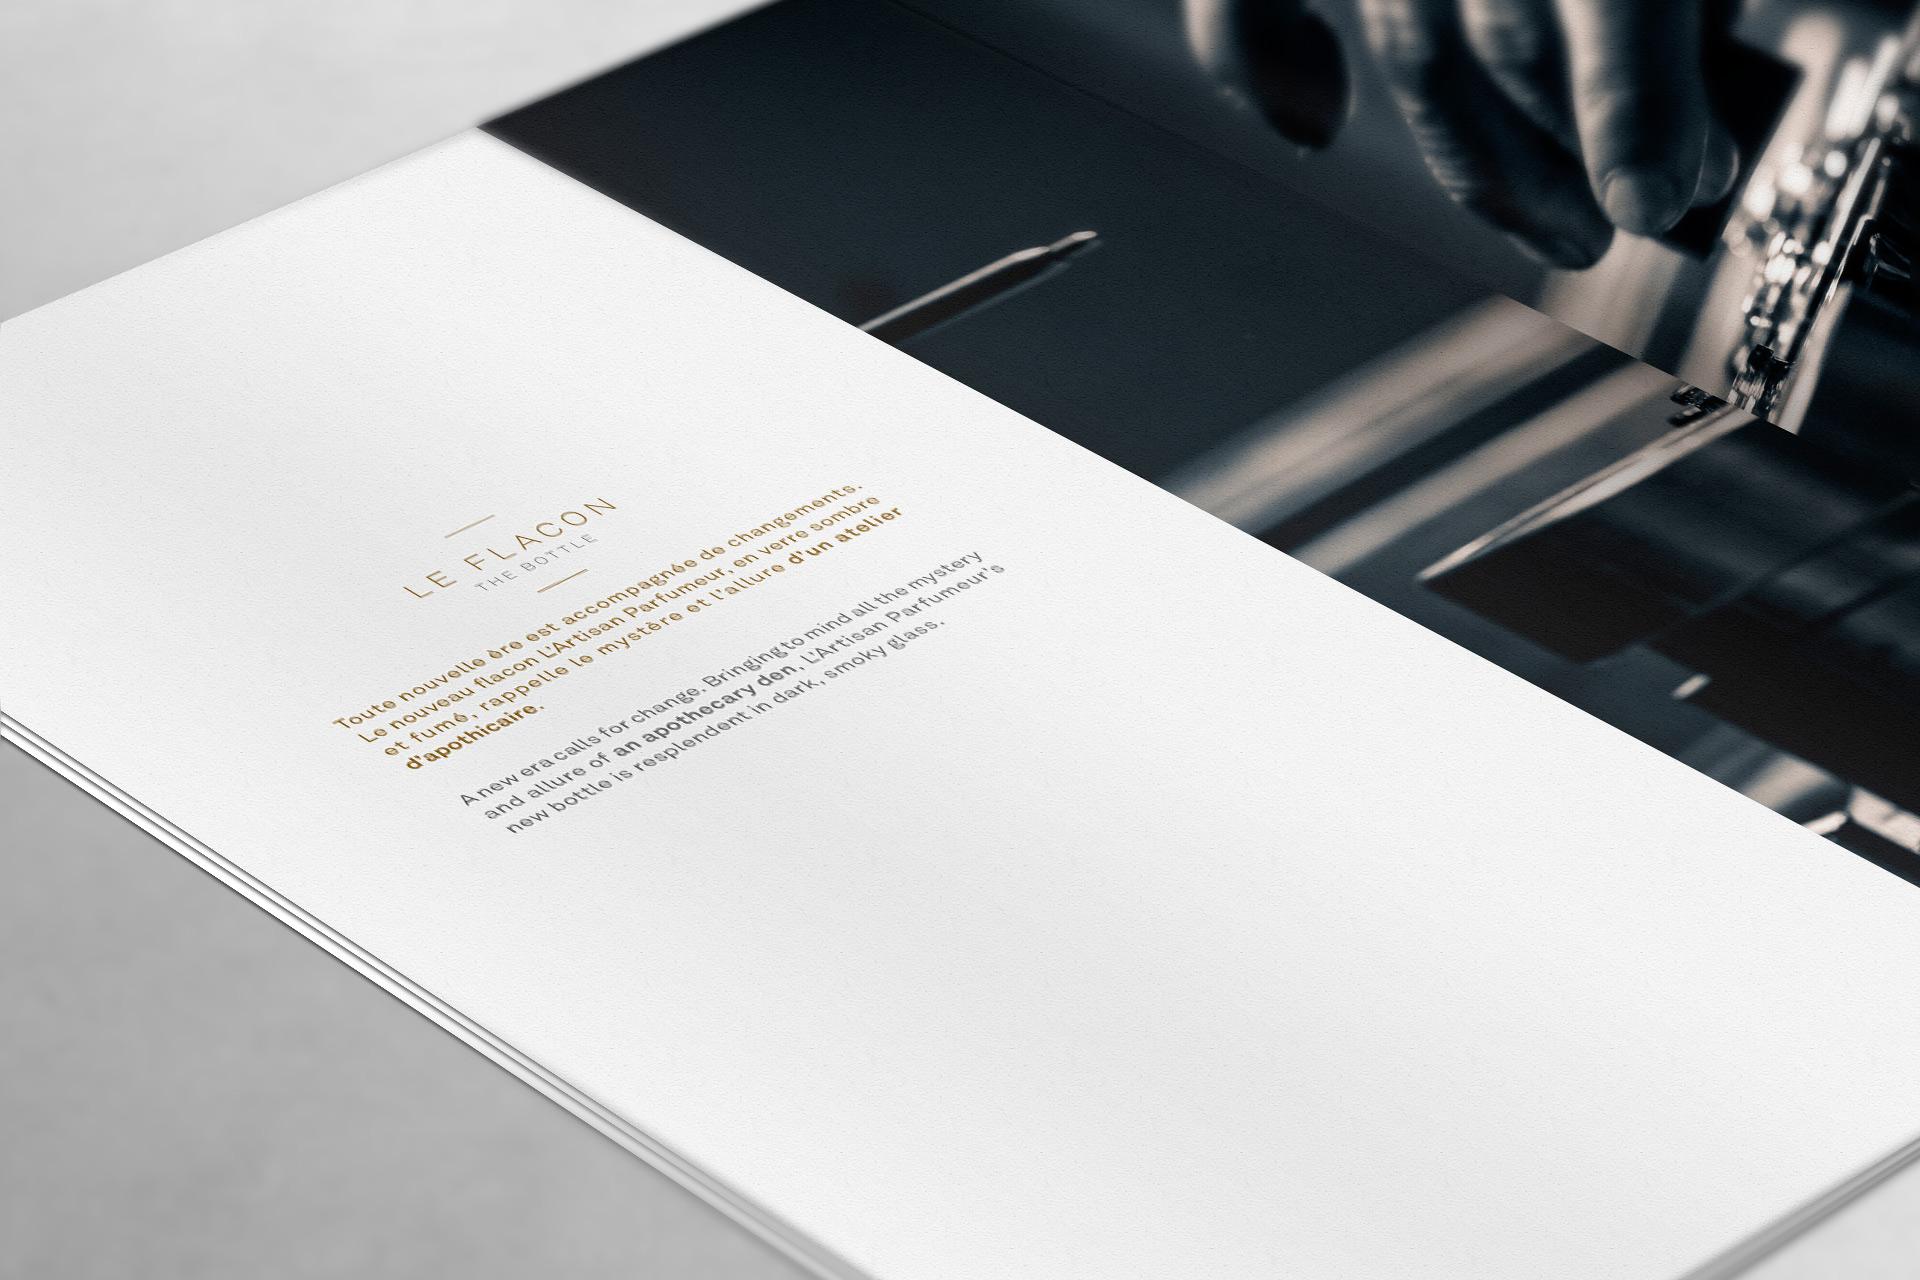 lartisan-parfumeur-visual-identity-design-pressbook-01.jpg